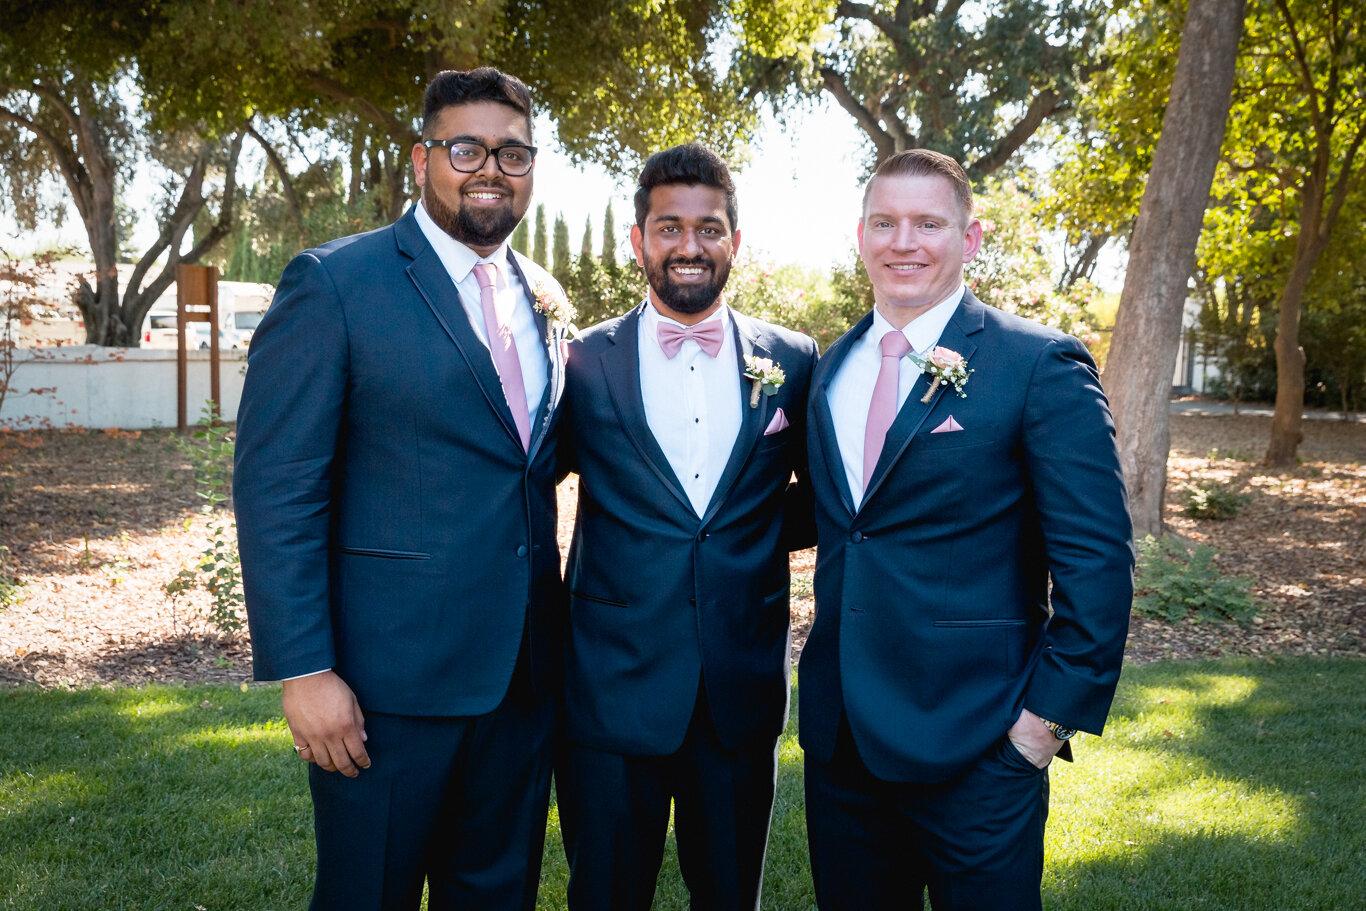 2019.08.24_Emily-Ashir-Wedding-at-the-Maples-5599.jpg